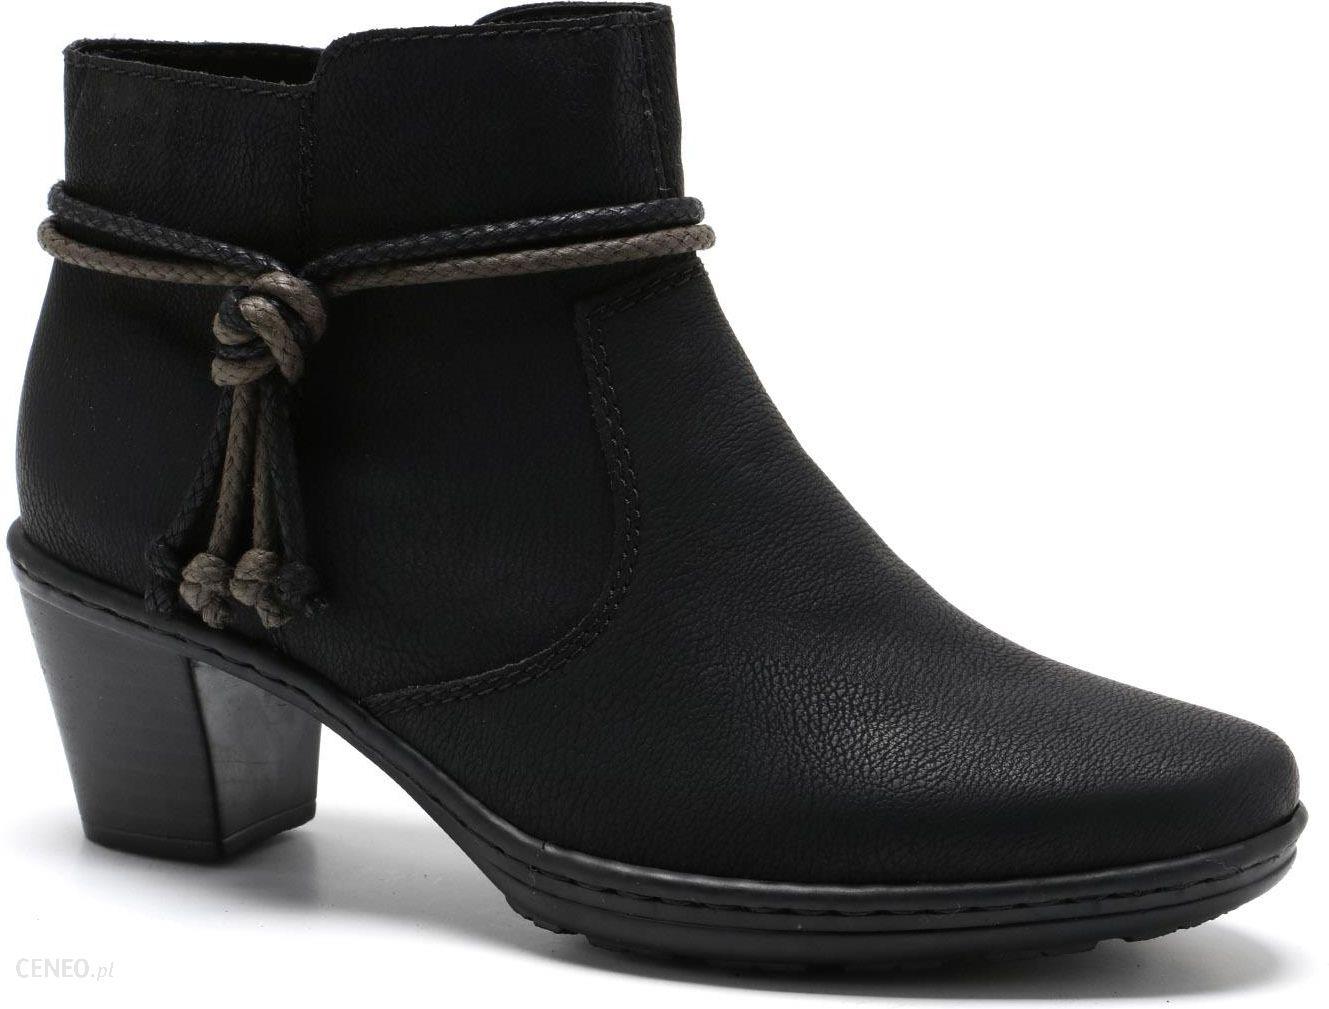 RYŁKO buty botki KLASA 7IY44B1 czarne welur 39 www